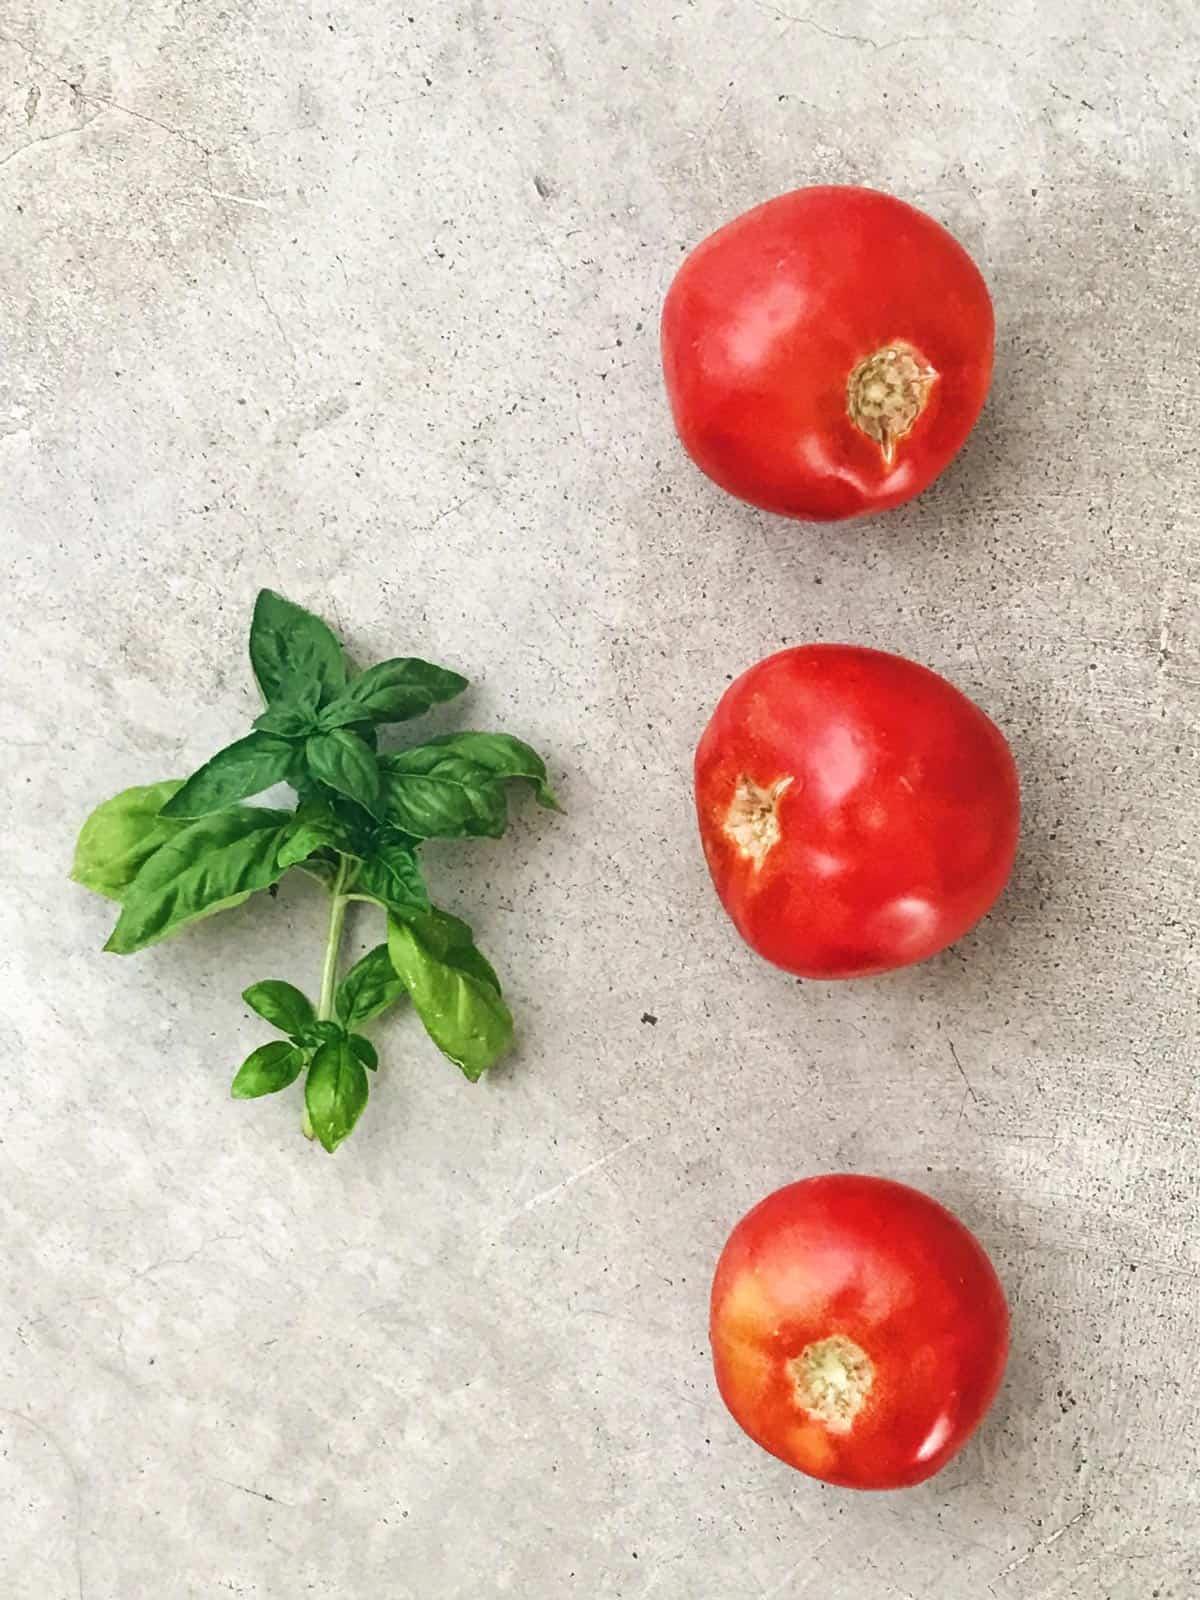 Ensalada de tomate solo